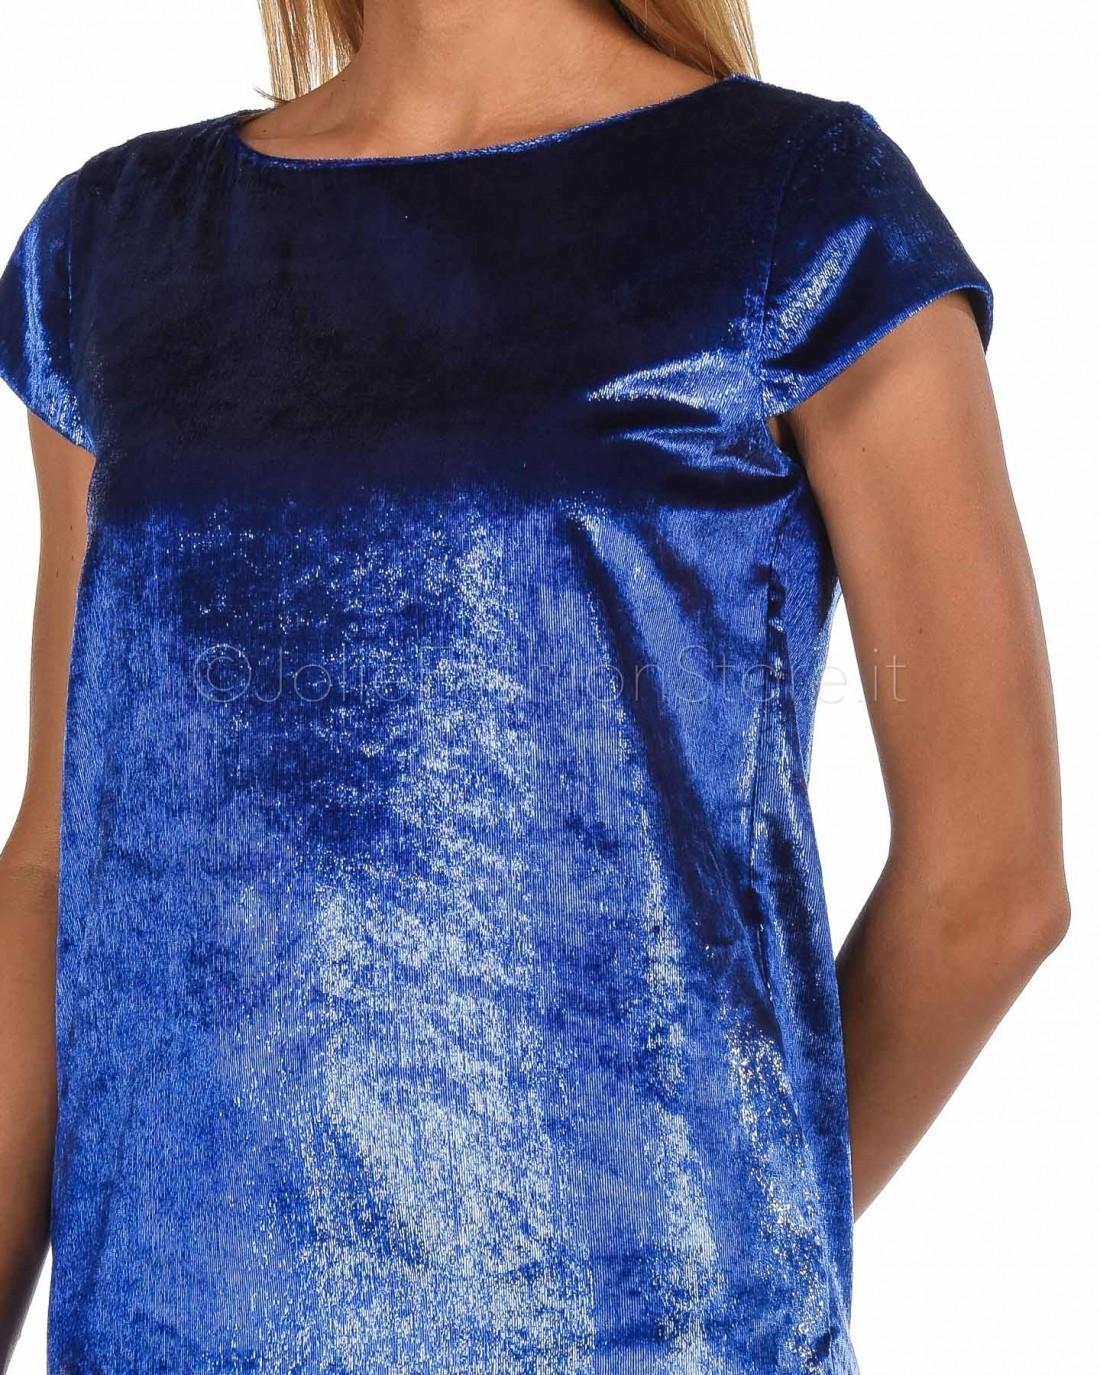 Solo 3 T-Shirt in Seta Arancione M10164_ARANCIO